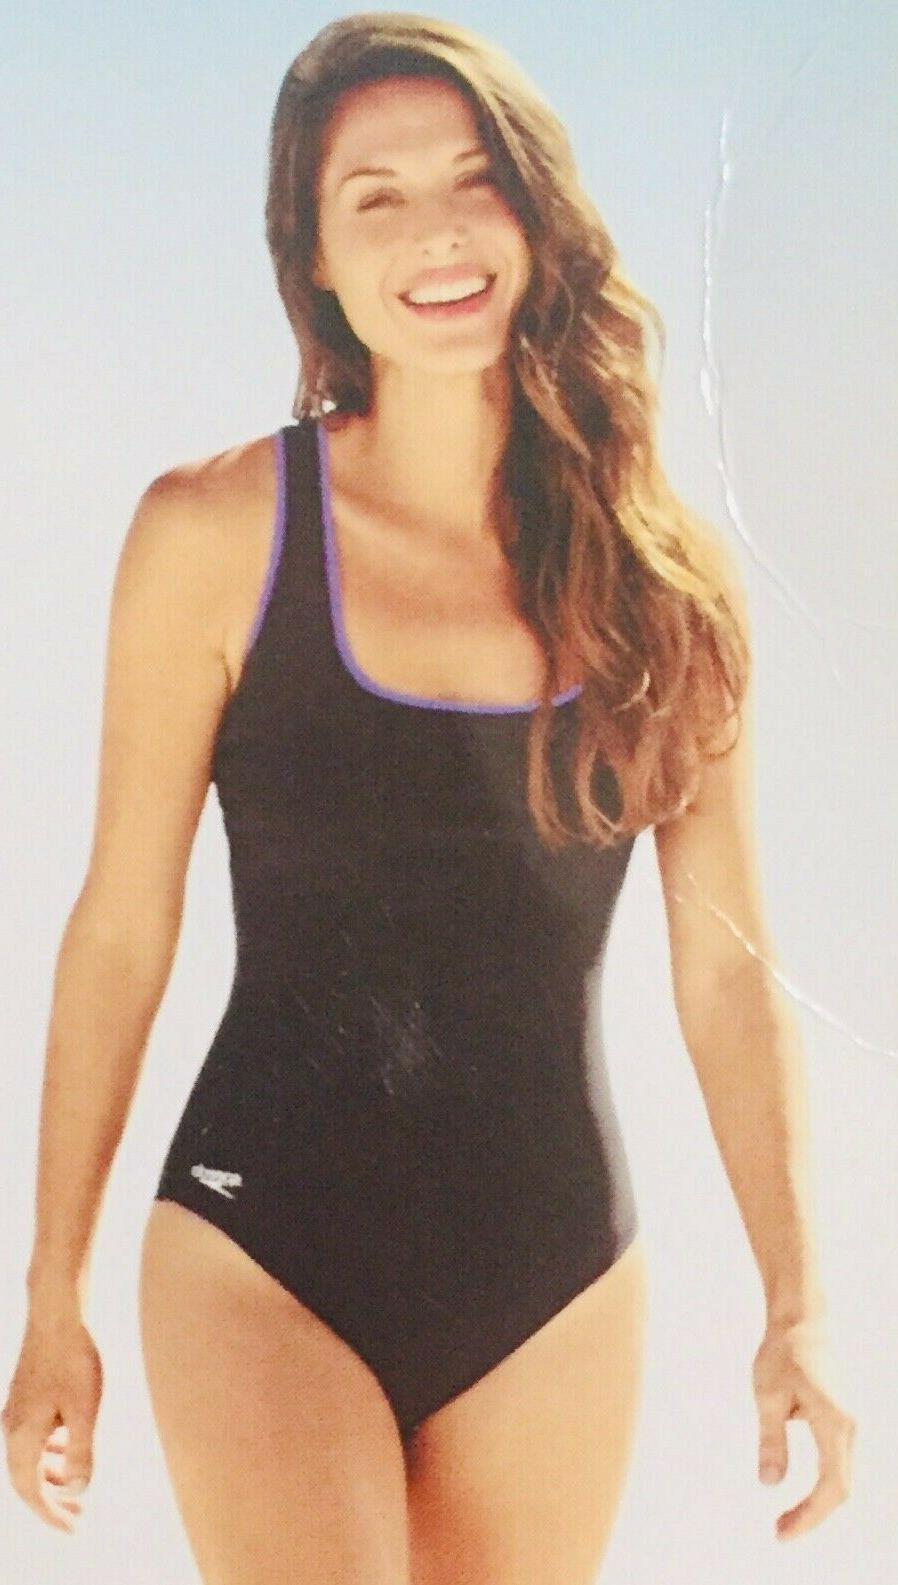 womens ultraback swimsuit bathing suit black purple